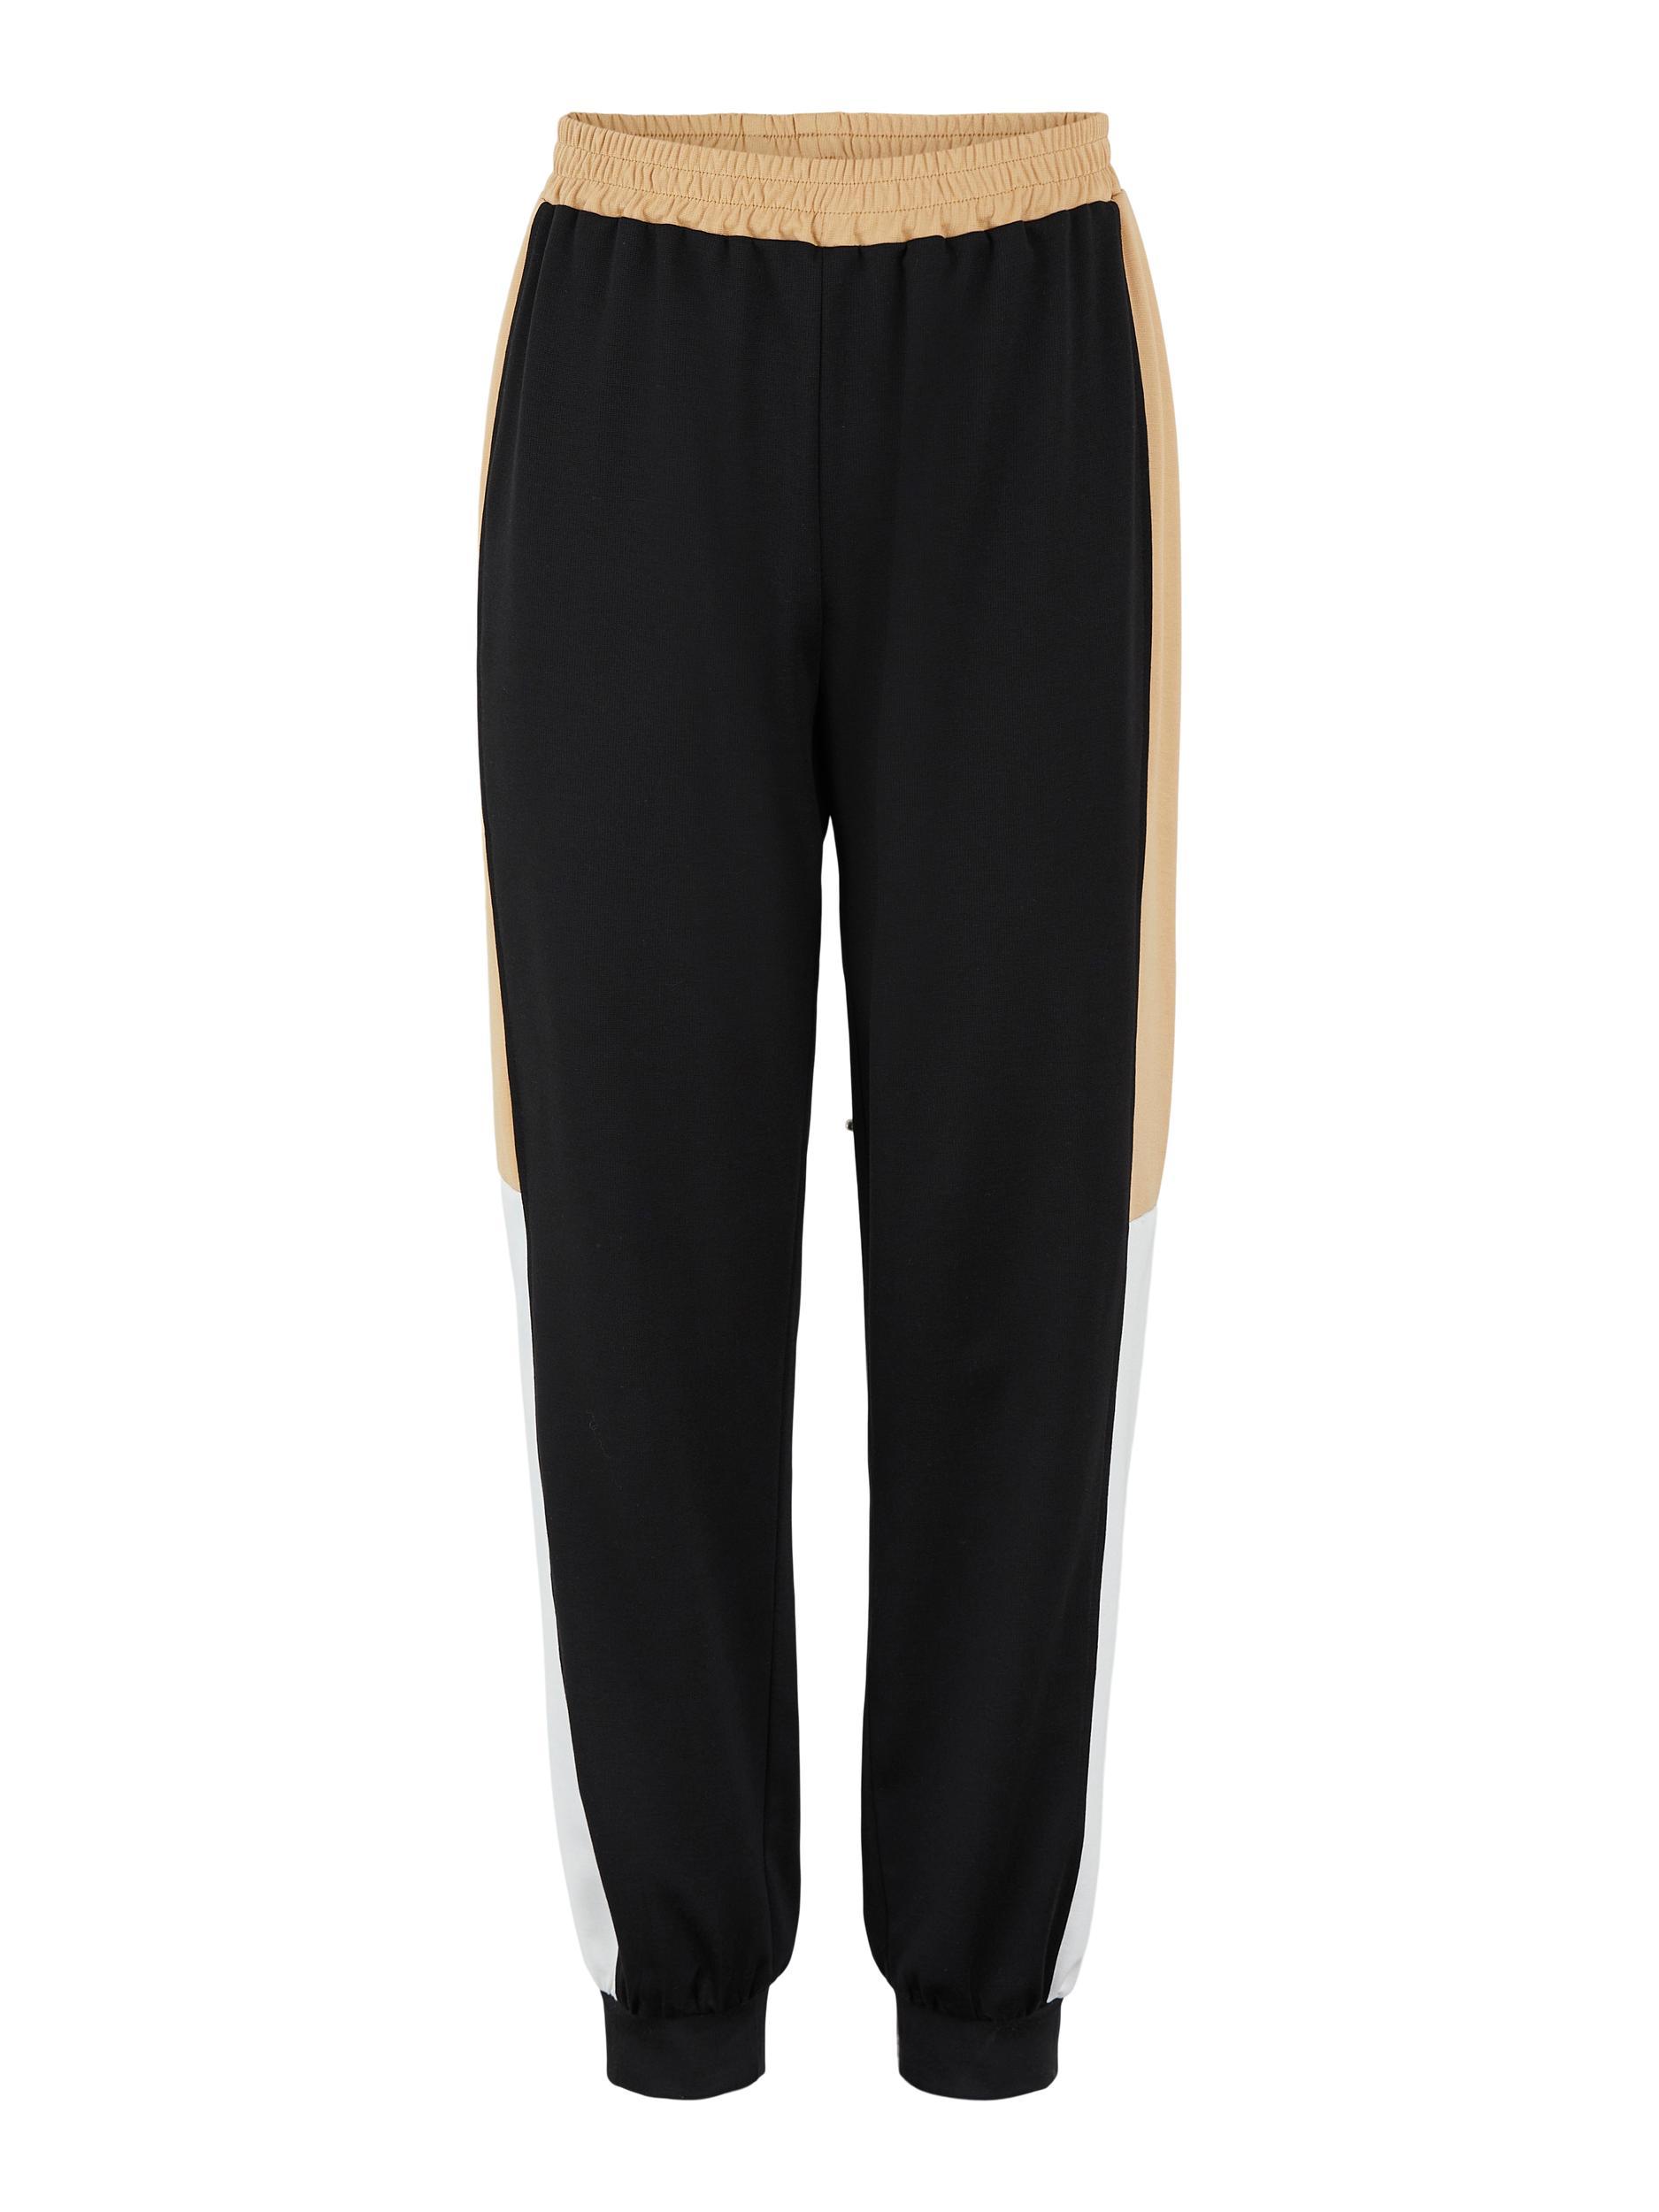 Pieces Maggya HW sweatpants, black, large